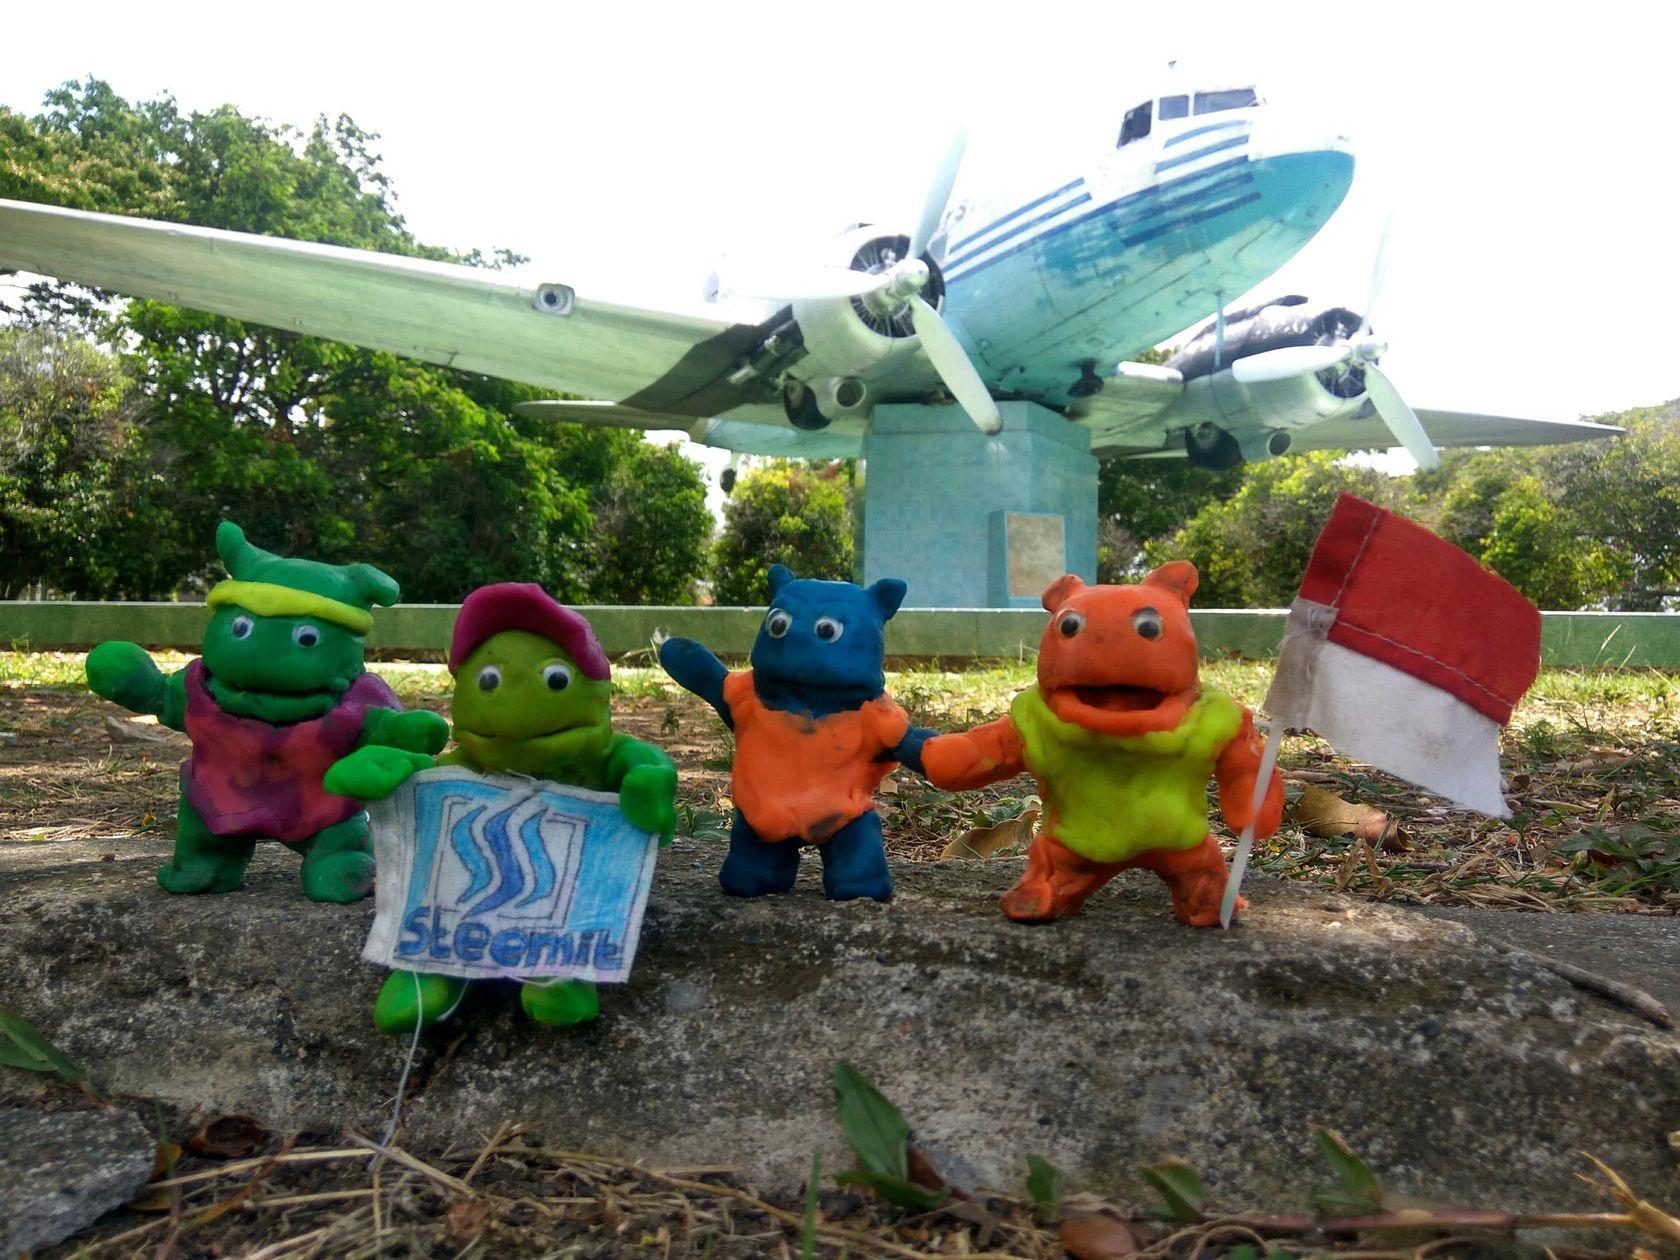 87 Kunjungan 4sekawan Lokasi Monumen Pesawat Seulawah Ri 001 Image